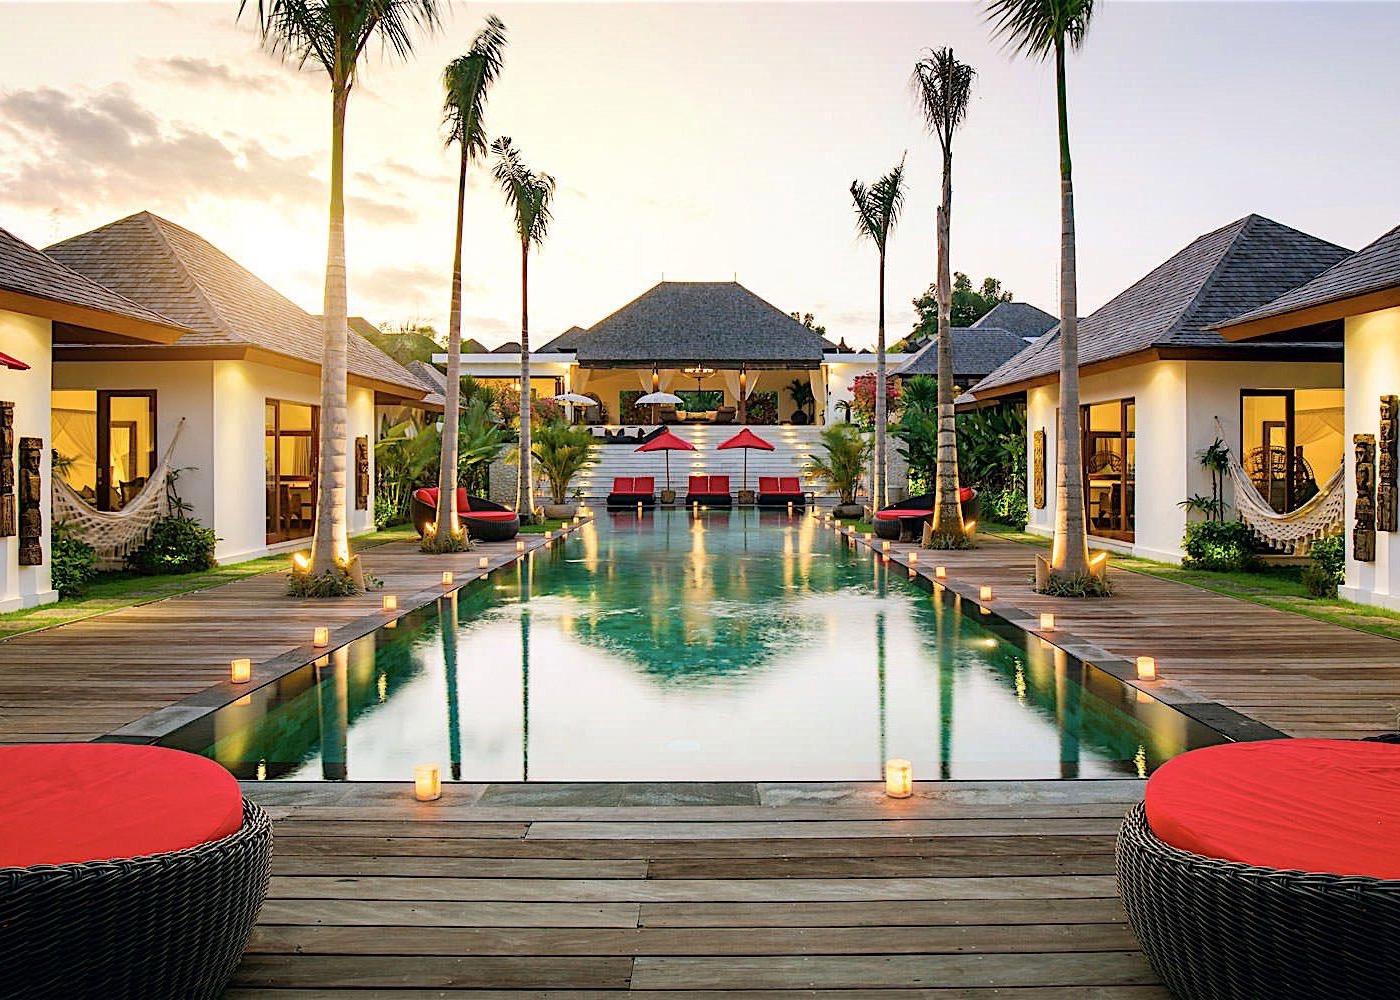 Villa Naty in Umalas - the best family-friendly villas in Bali, Indonesia